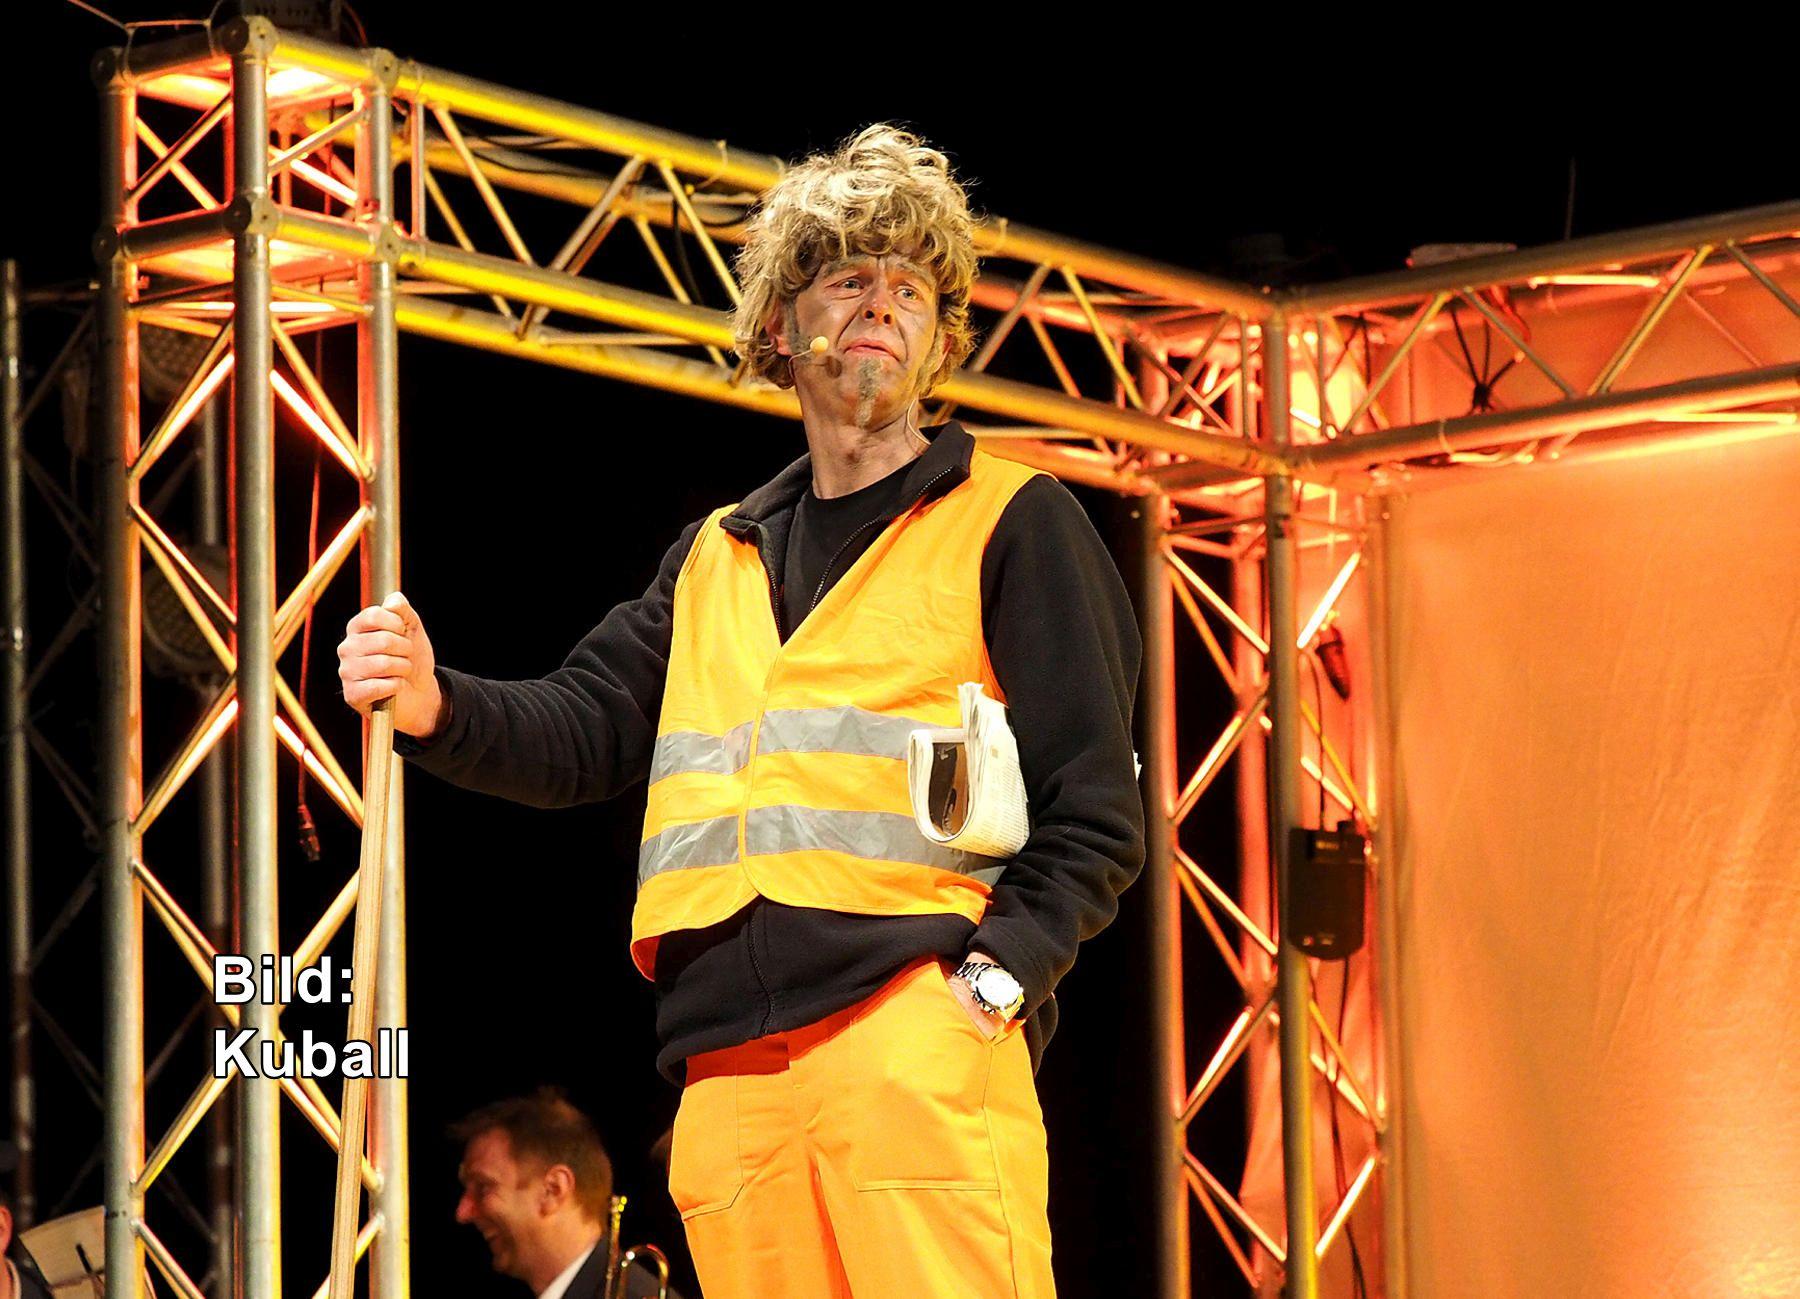 Fasnet Eröffnungsball Horb 5.2.2017.Bilder: Kuball